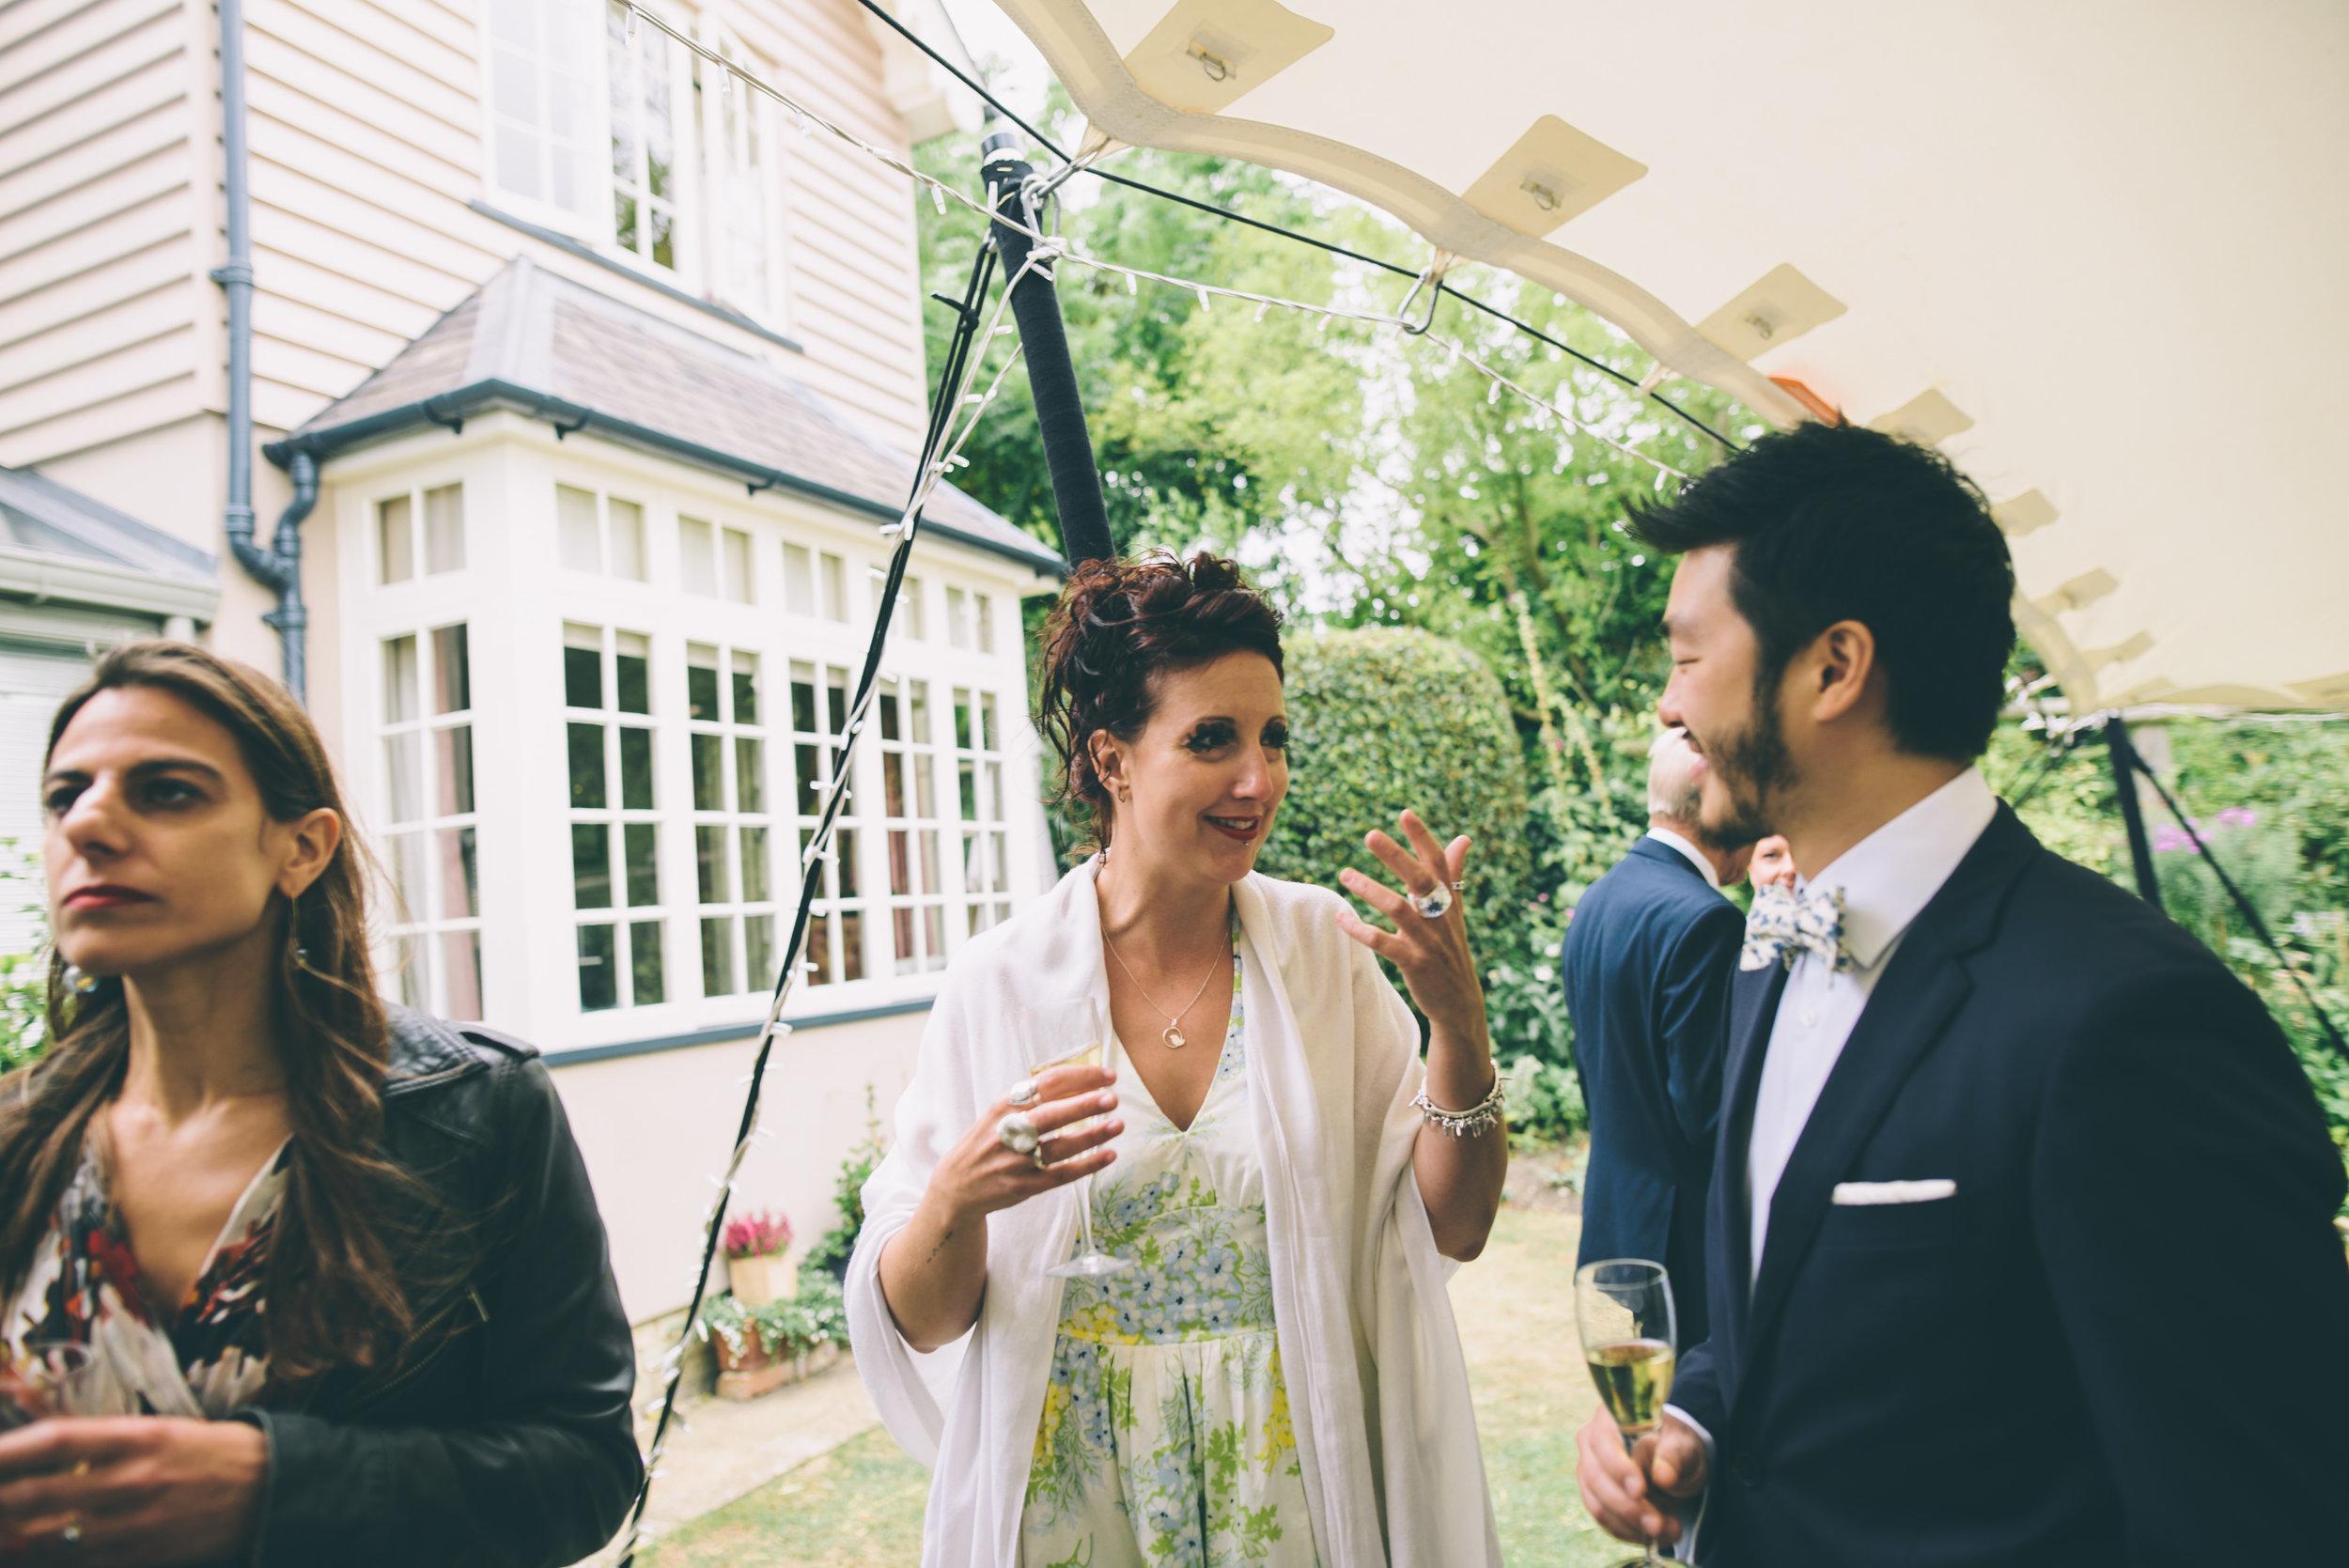 Garden Wedding photography Barley Herefordshire - Tracy + Matt -264.jpg